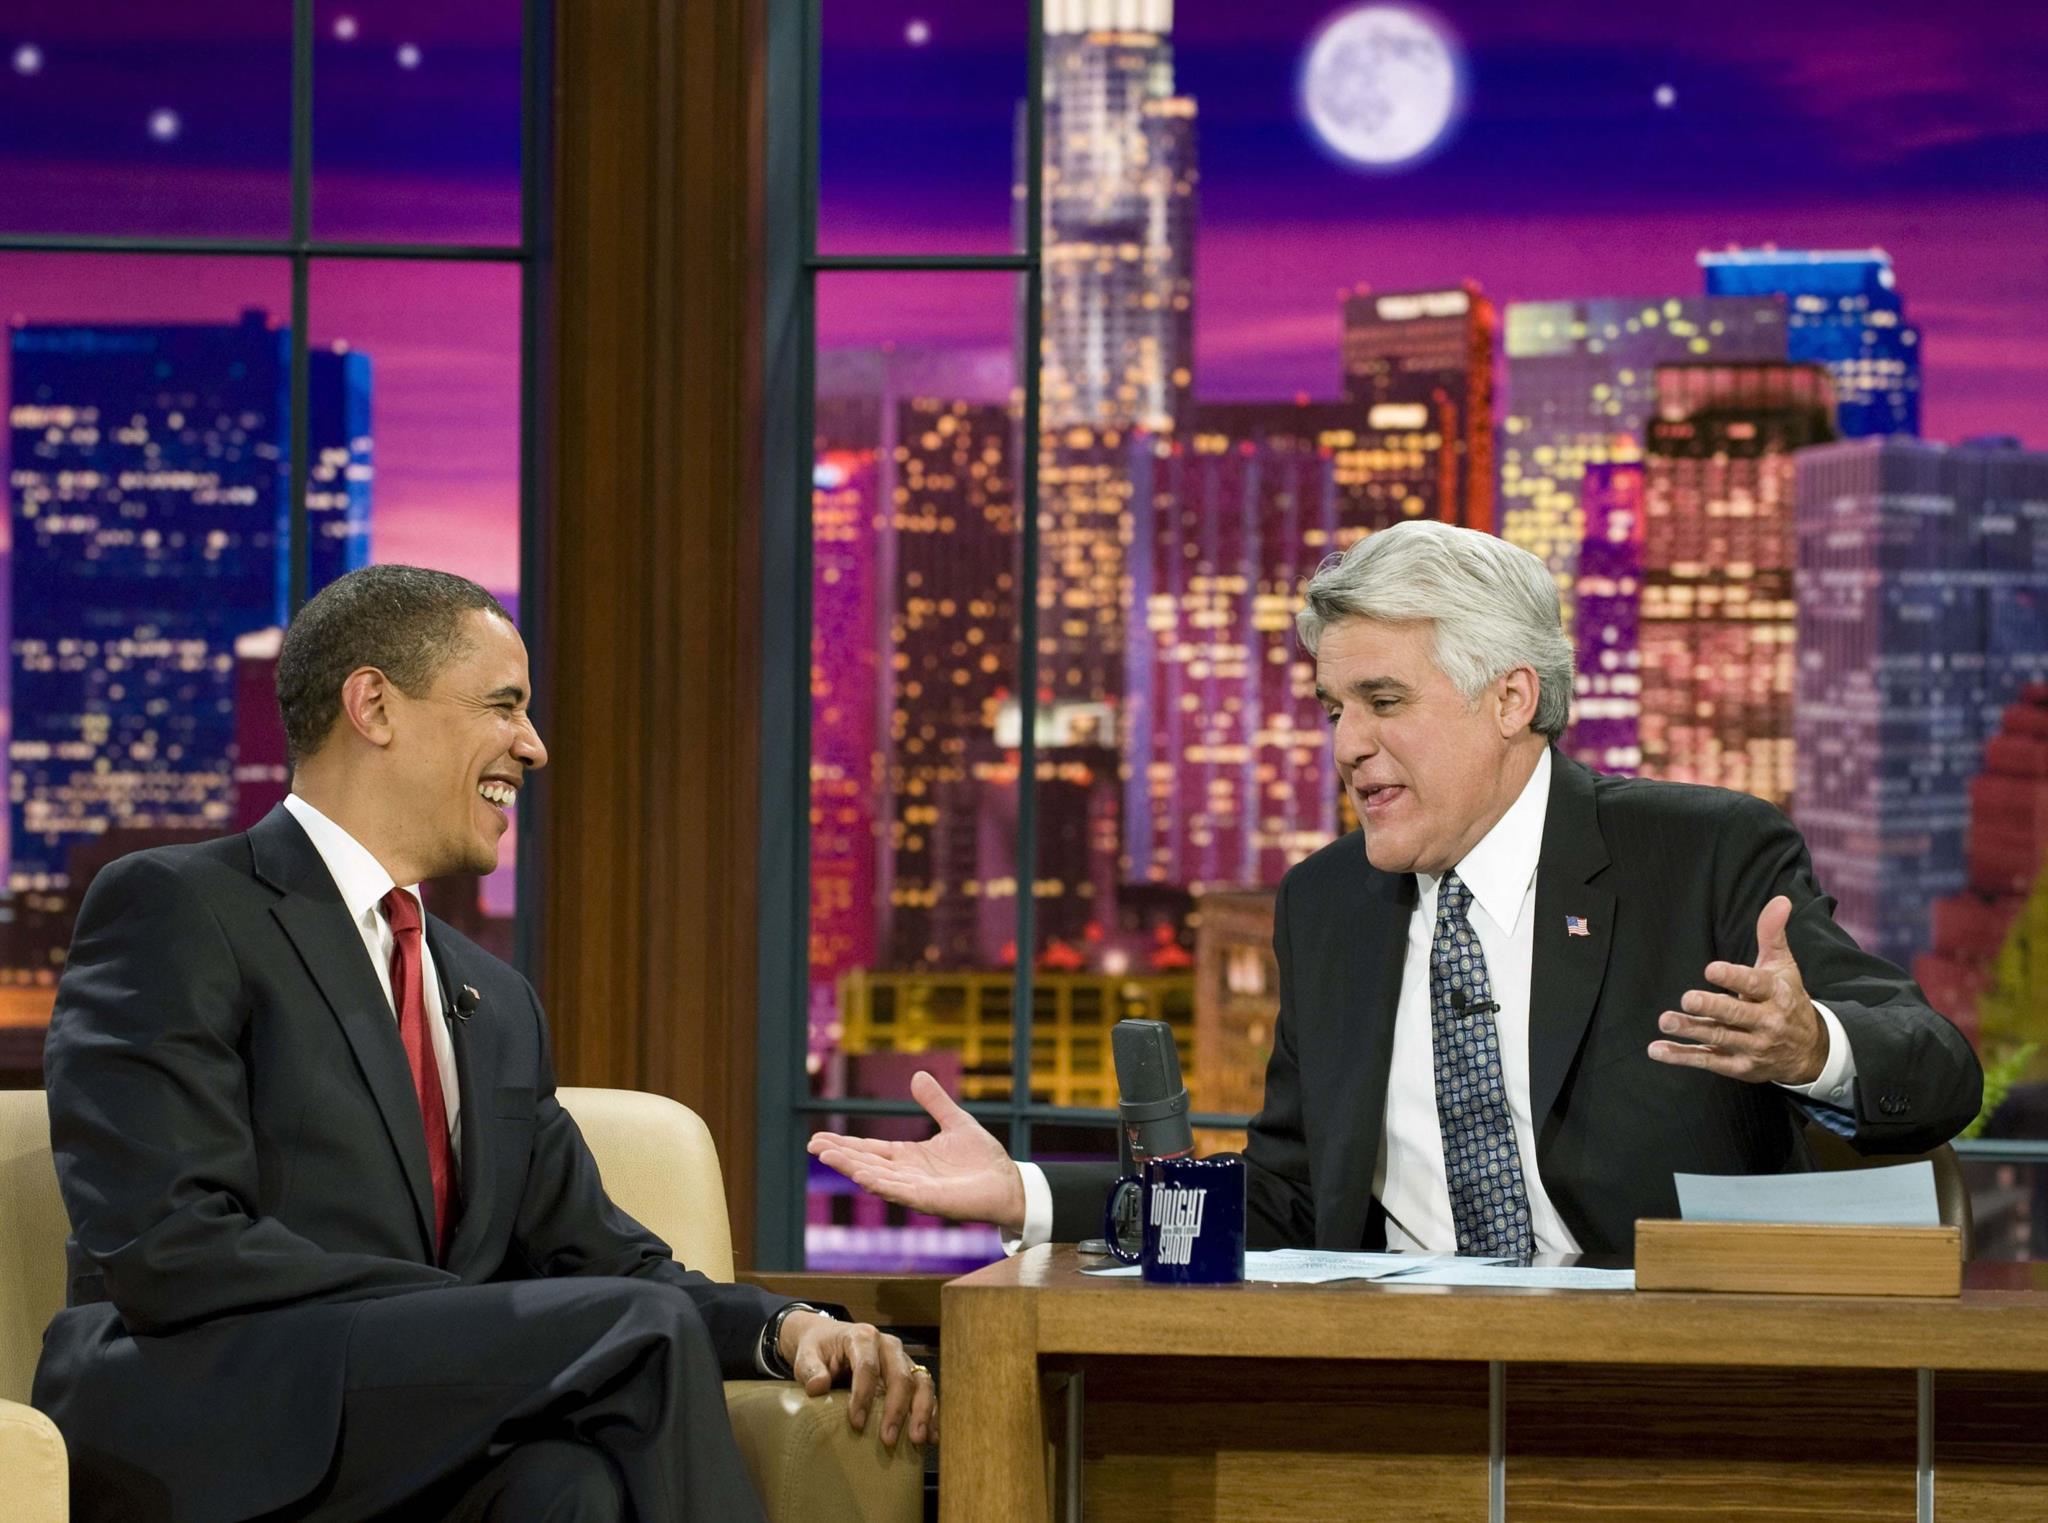 Obama a falar com o comediante Jay Leno no programa televisivo <i>The Tonight Show with Jay Leno</i> (O Programa da Noite com Jay Leno), 2009